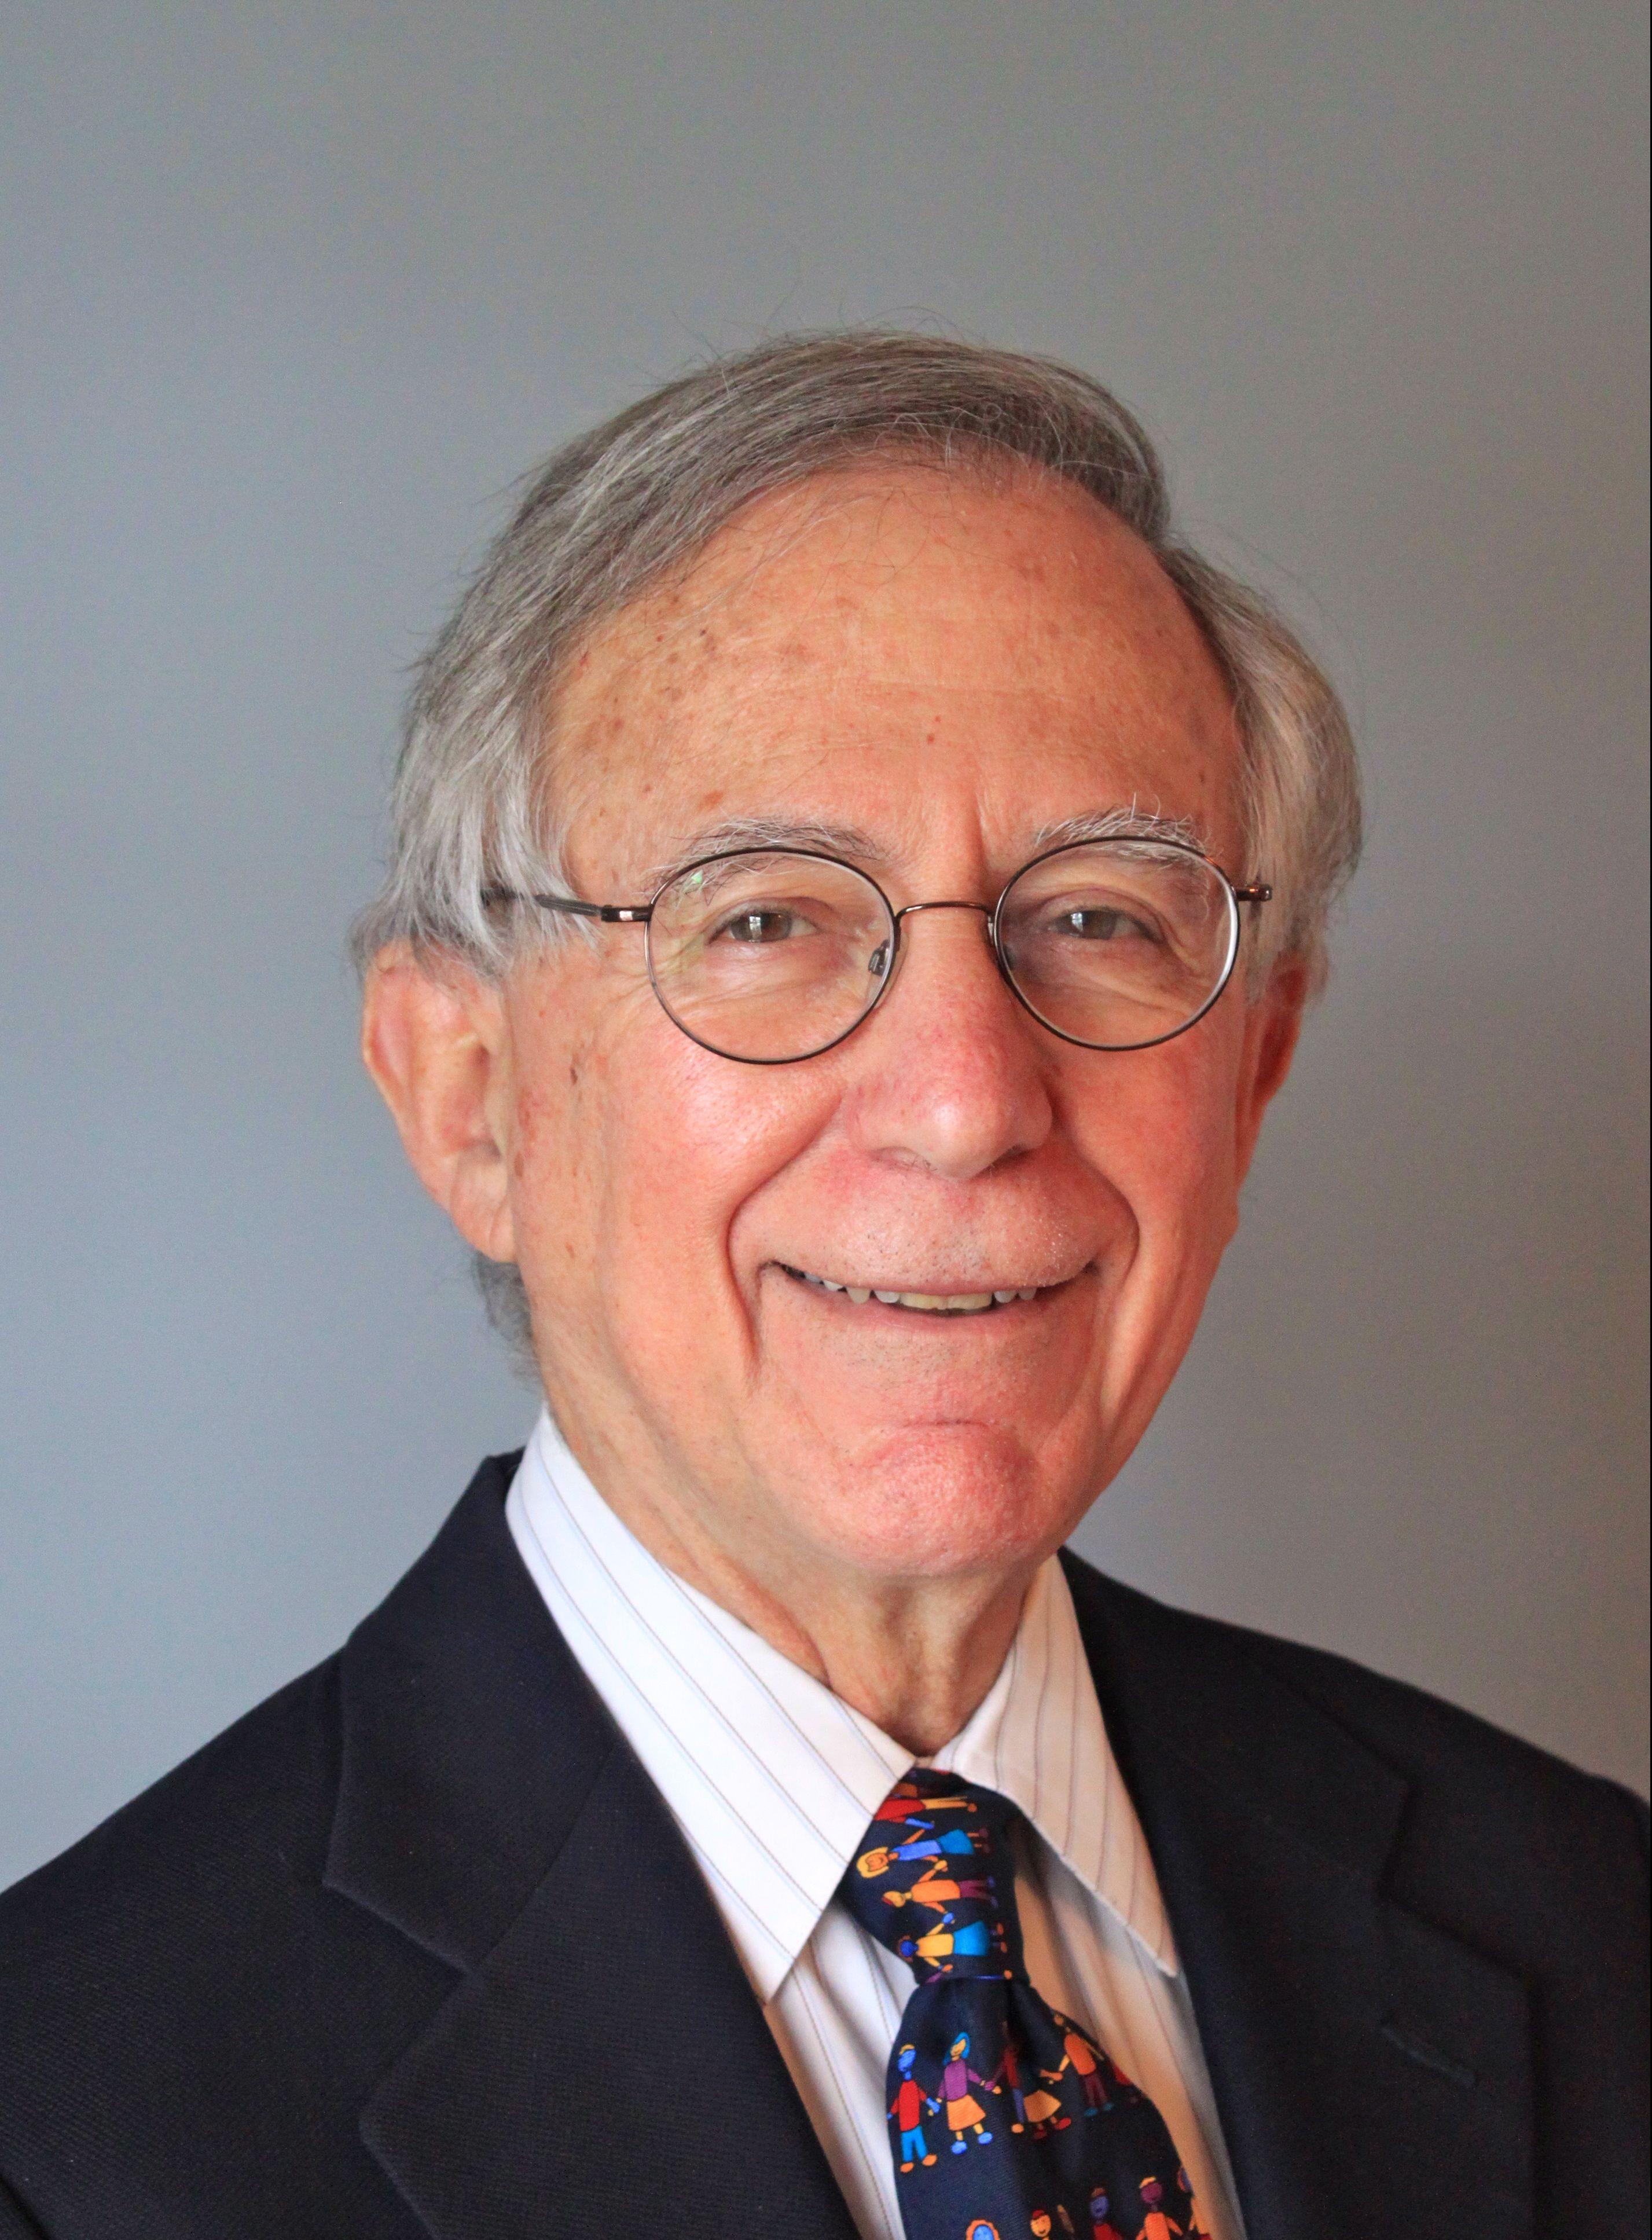 James M. Perrin, M.D.